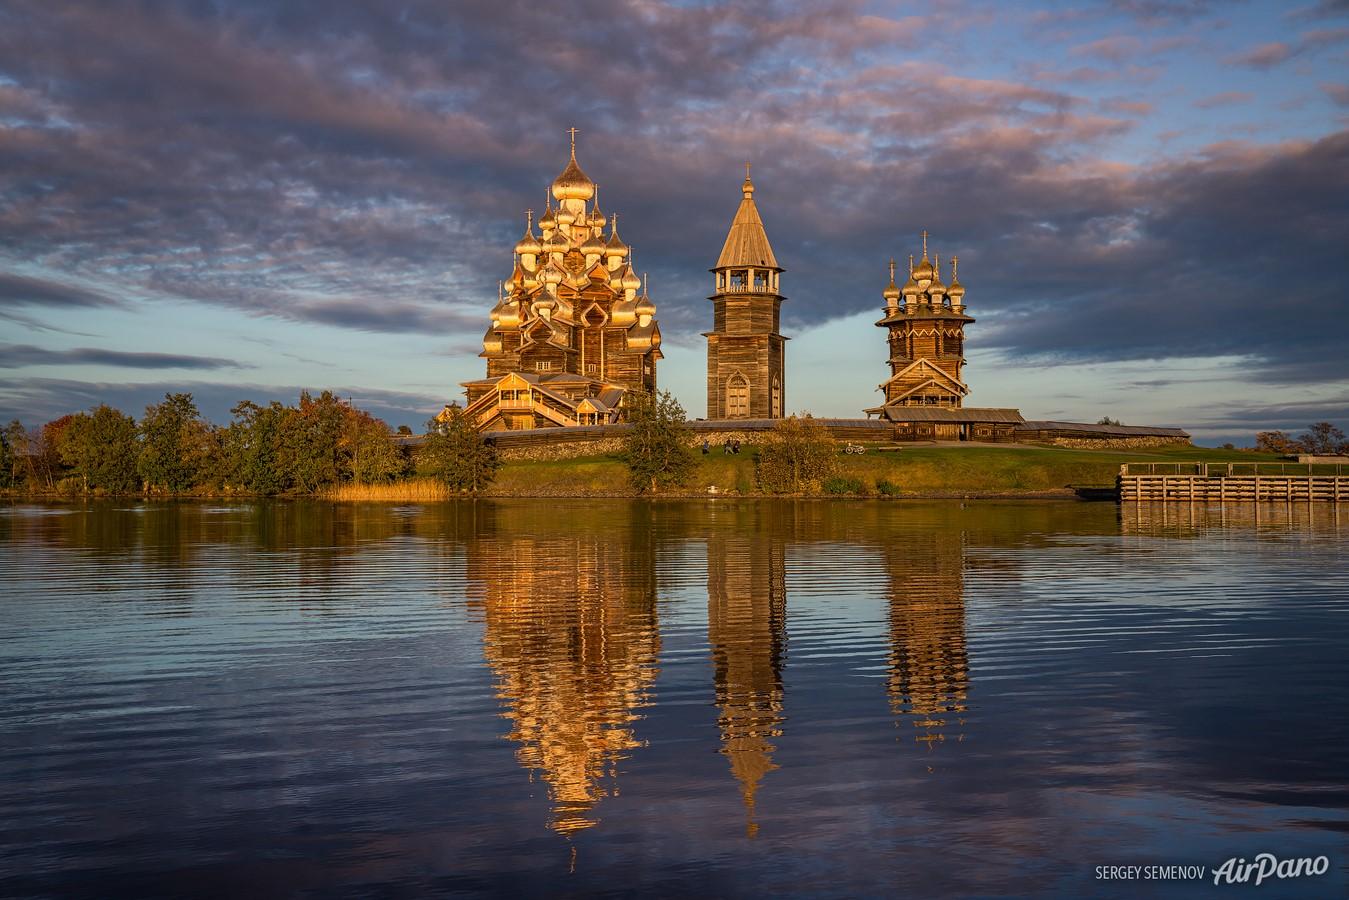 Wooden Architecture of Kizhi Island, Russia - Sheet3